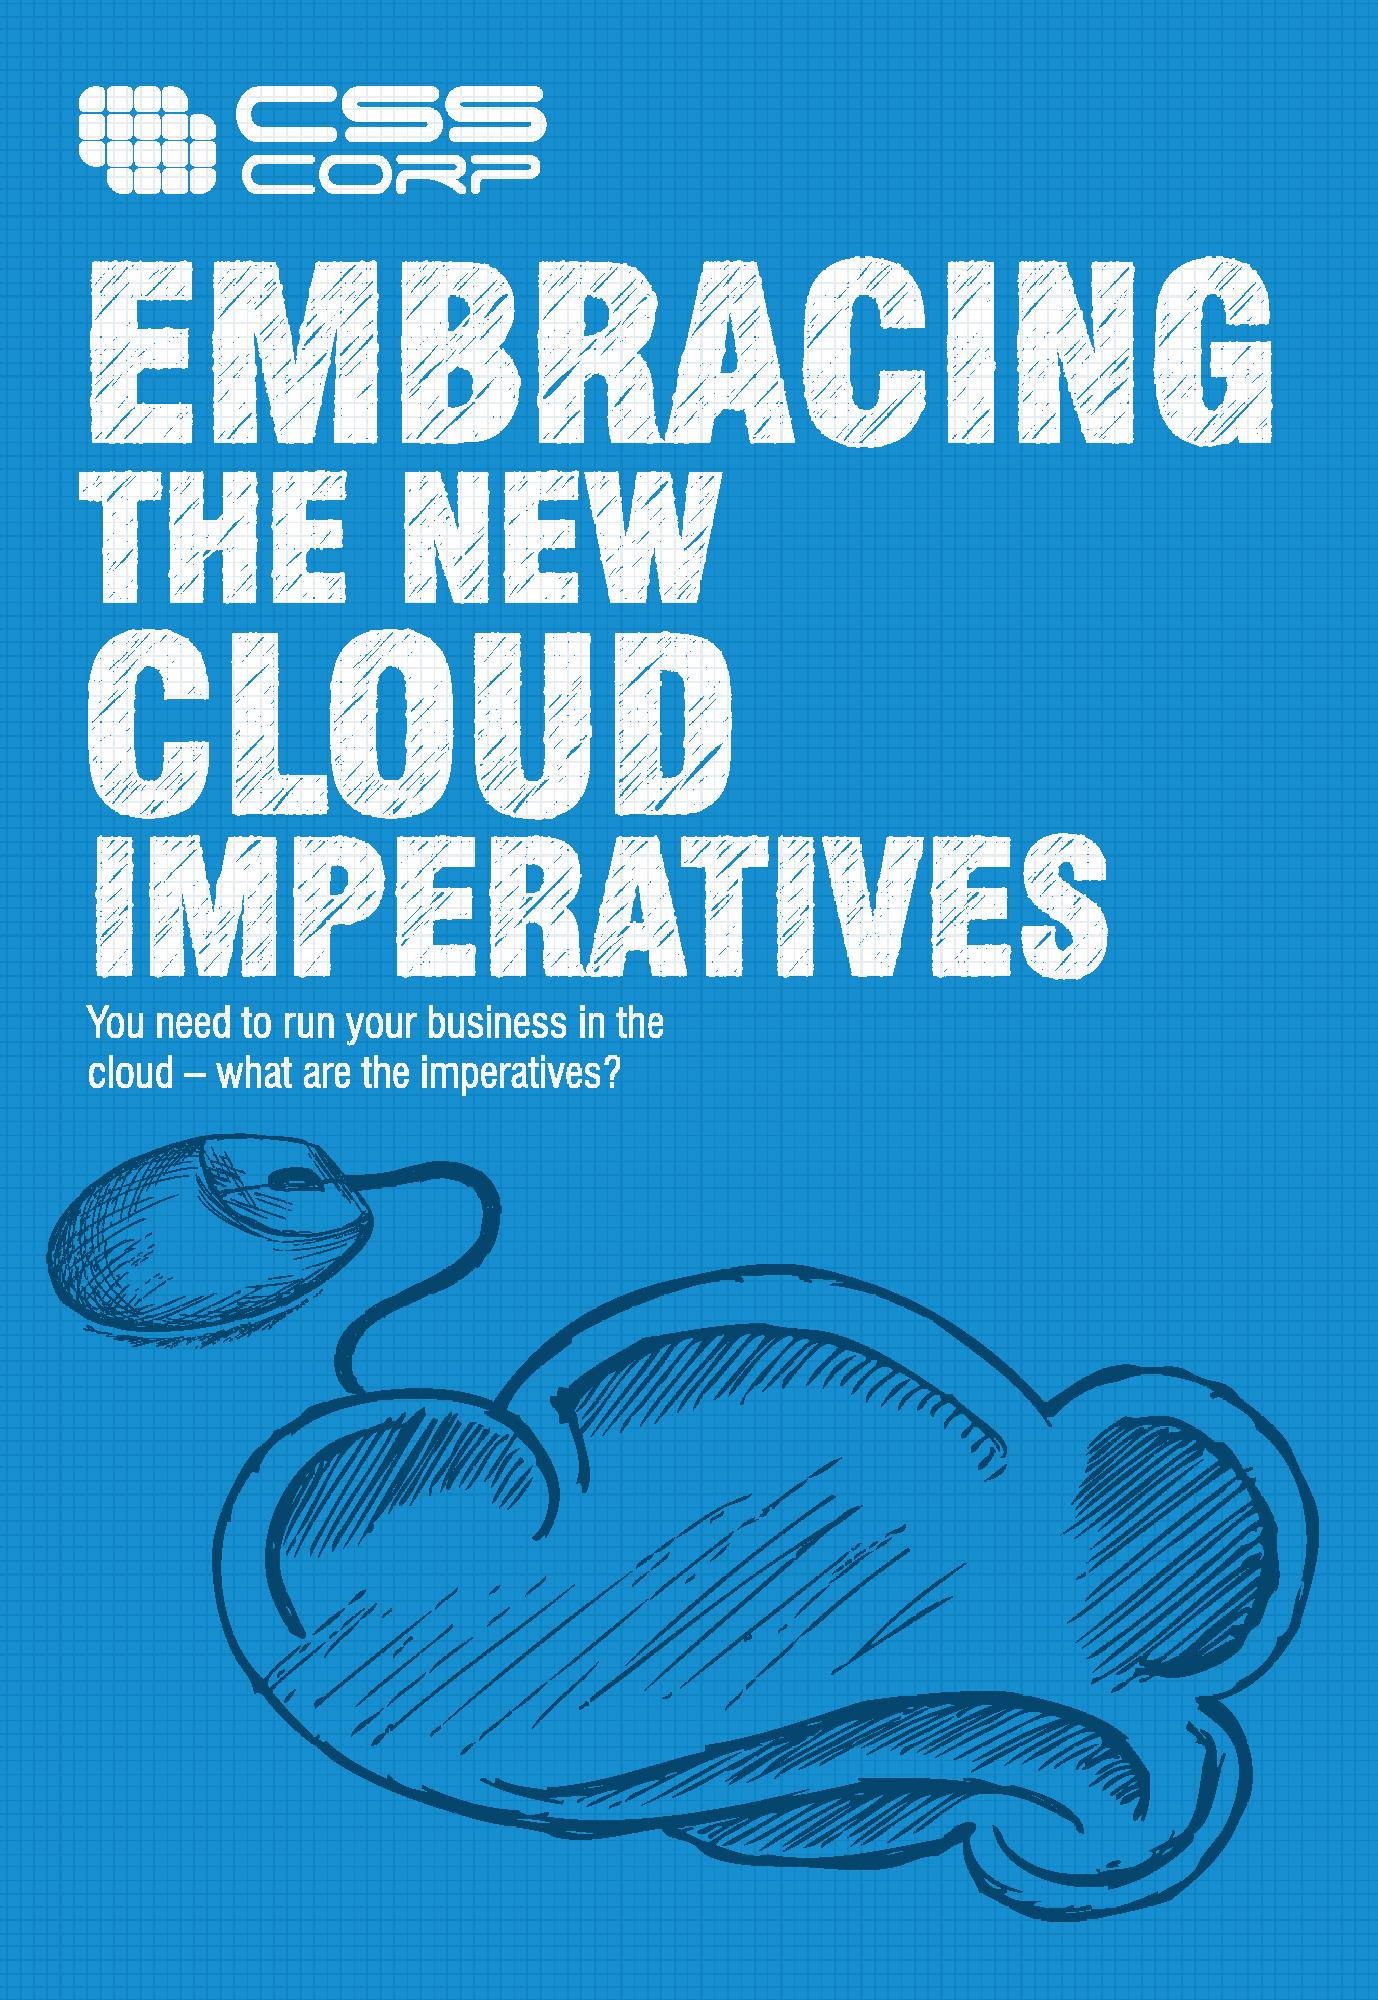 Cloud Strategy roadmap